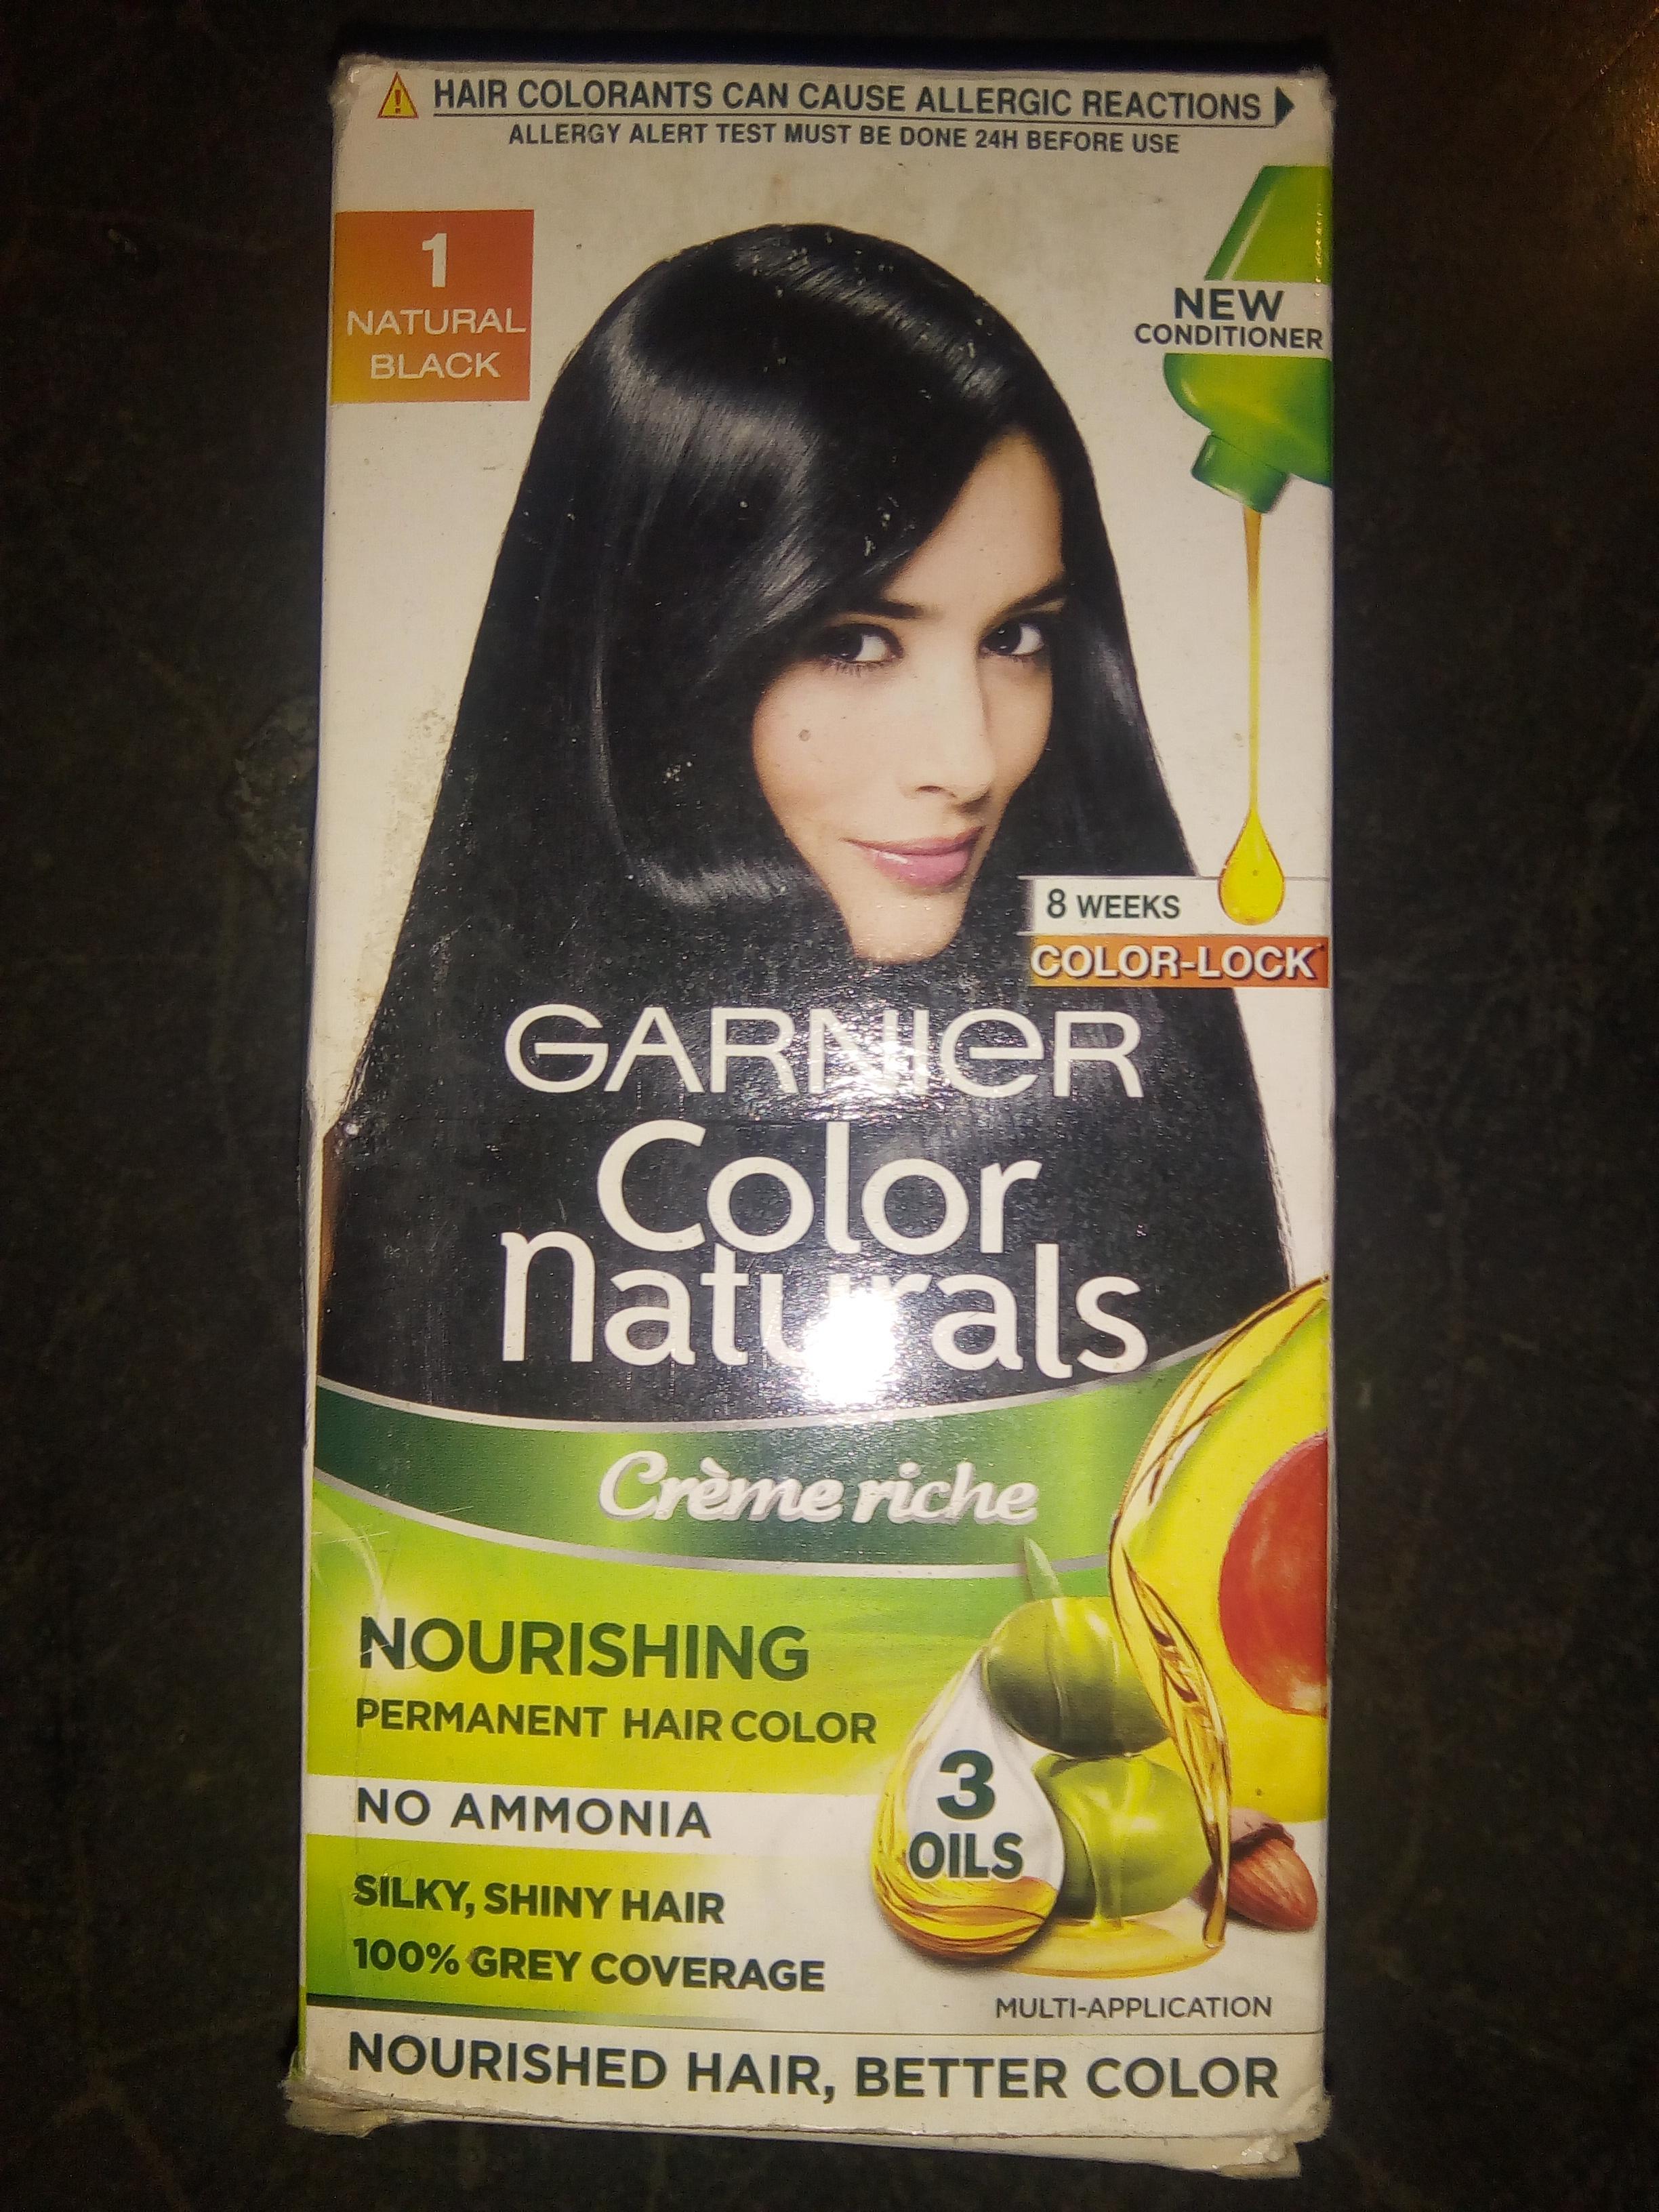 Garnier Color Naturals Creme Hair Color-Garnier Color Naturals Creme Hair Color-By aflyingsoul